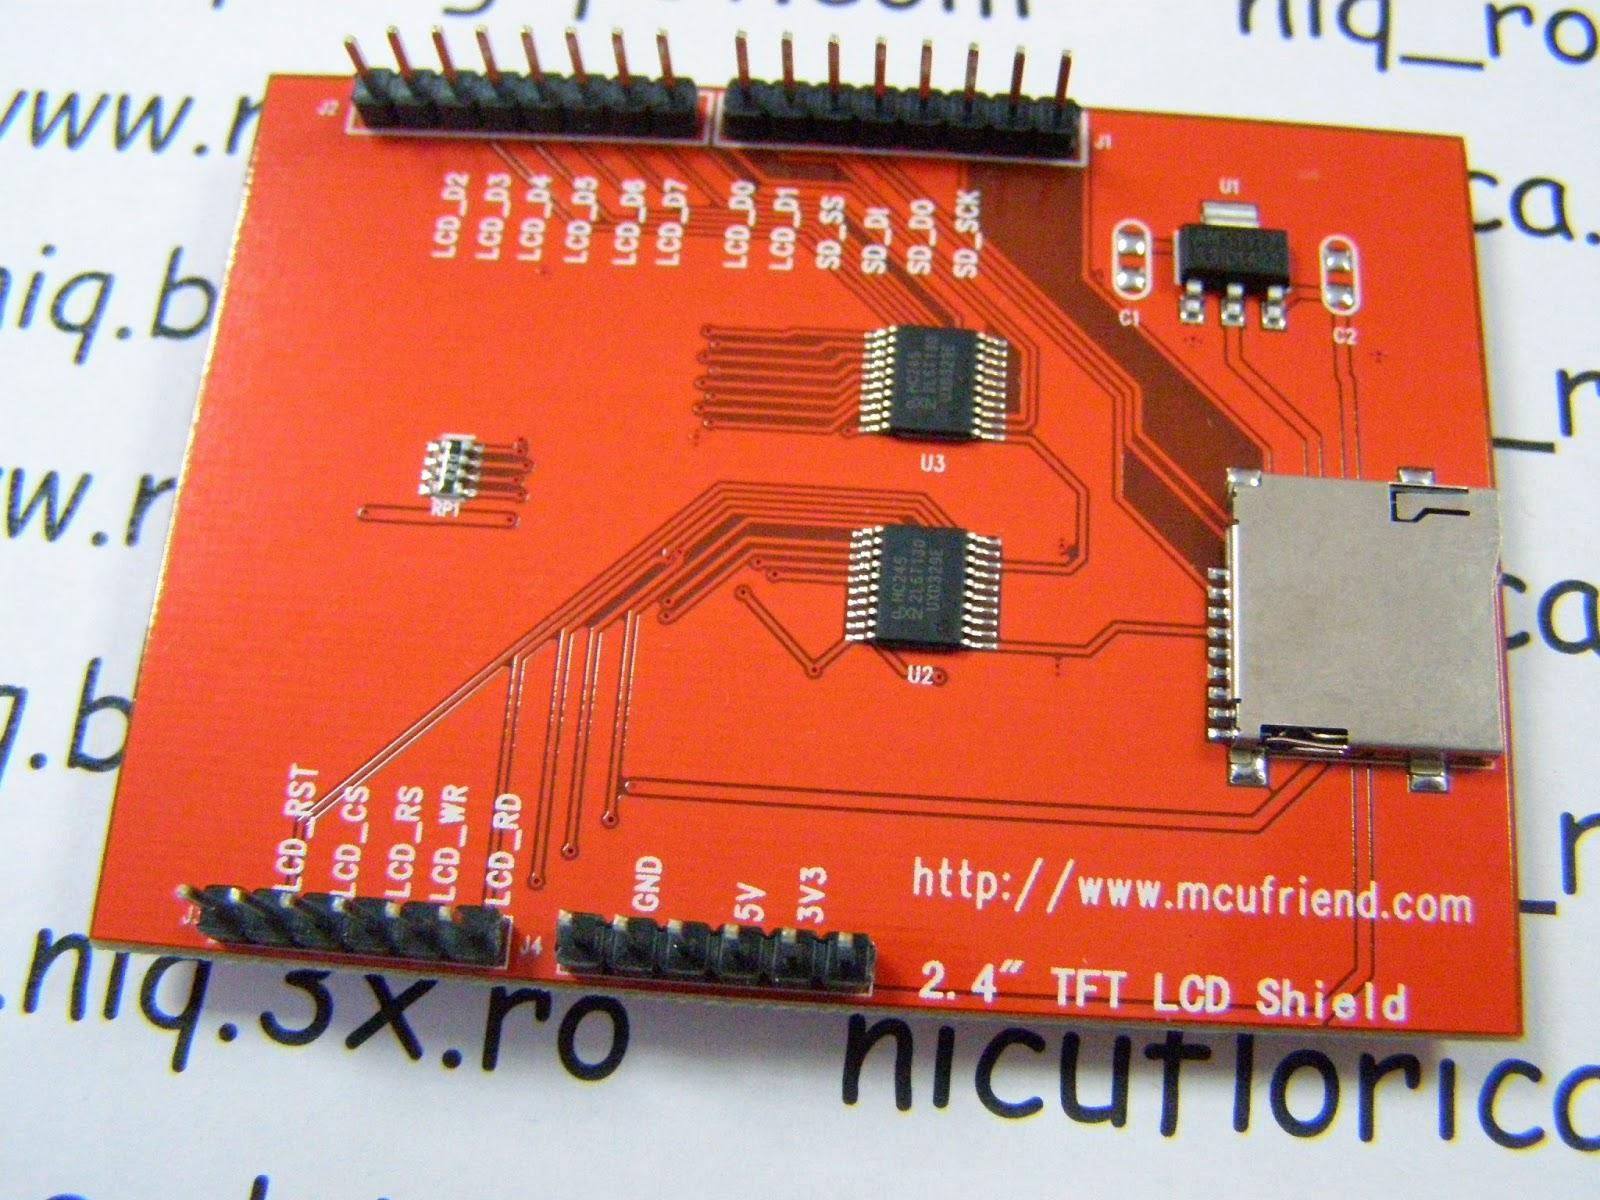 arduino tehniq 2 4 touch tft lcd shield rh arduinotehniq blogspot com arduino tft lcd screen wiring I2C Arduino TFT LCD